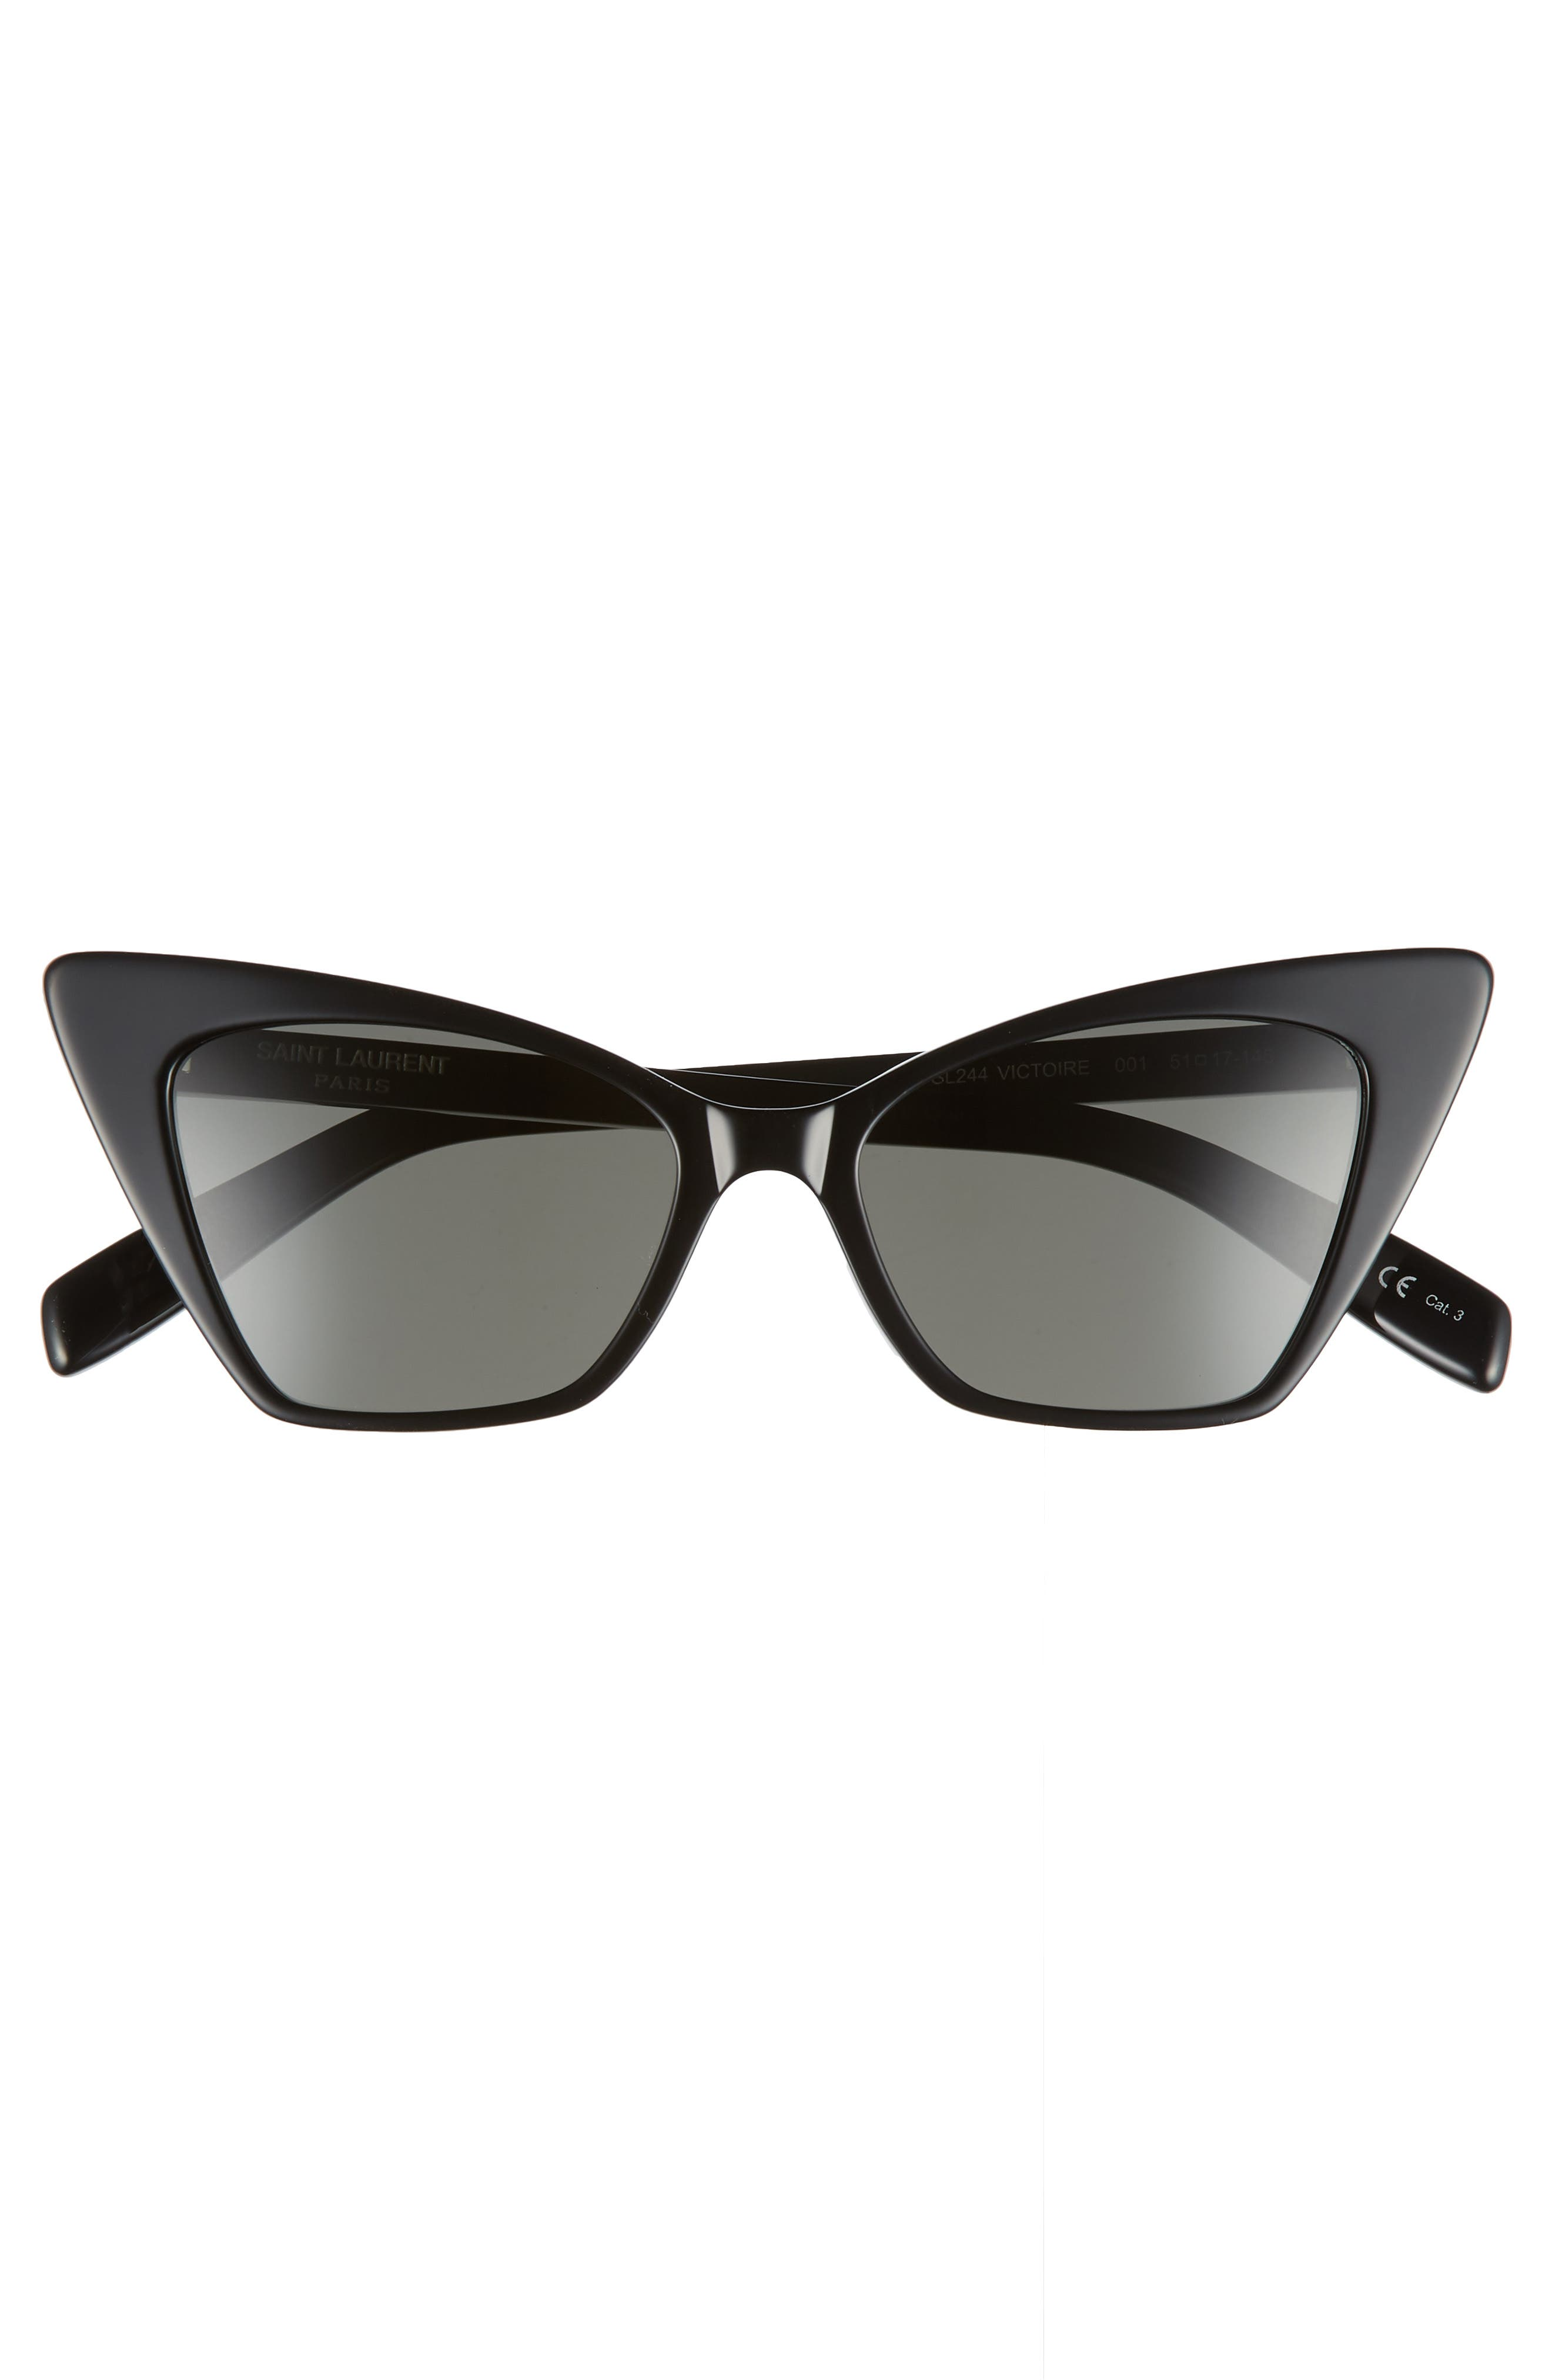 SAINT LAURENT, 51mm Cat Eye Sunglasses, Alternate thumbnail 3, color, BLACK